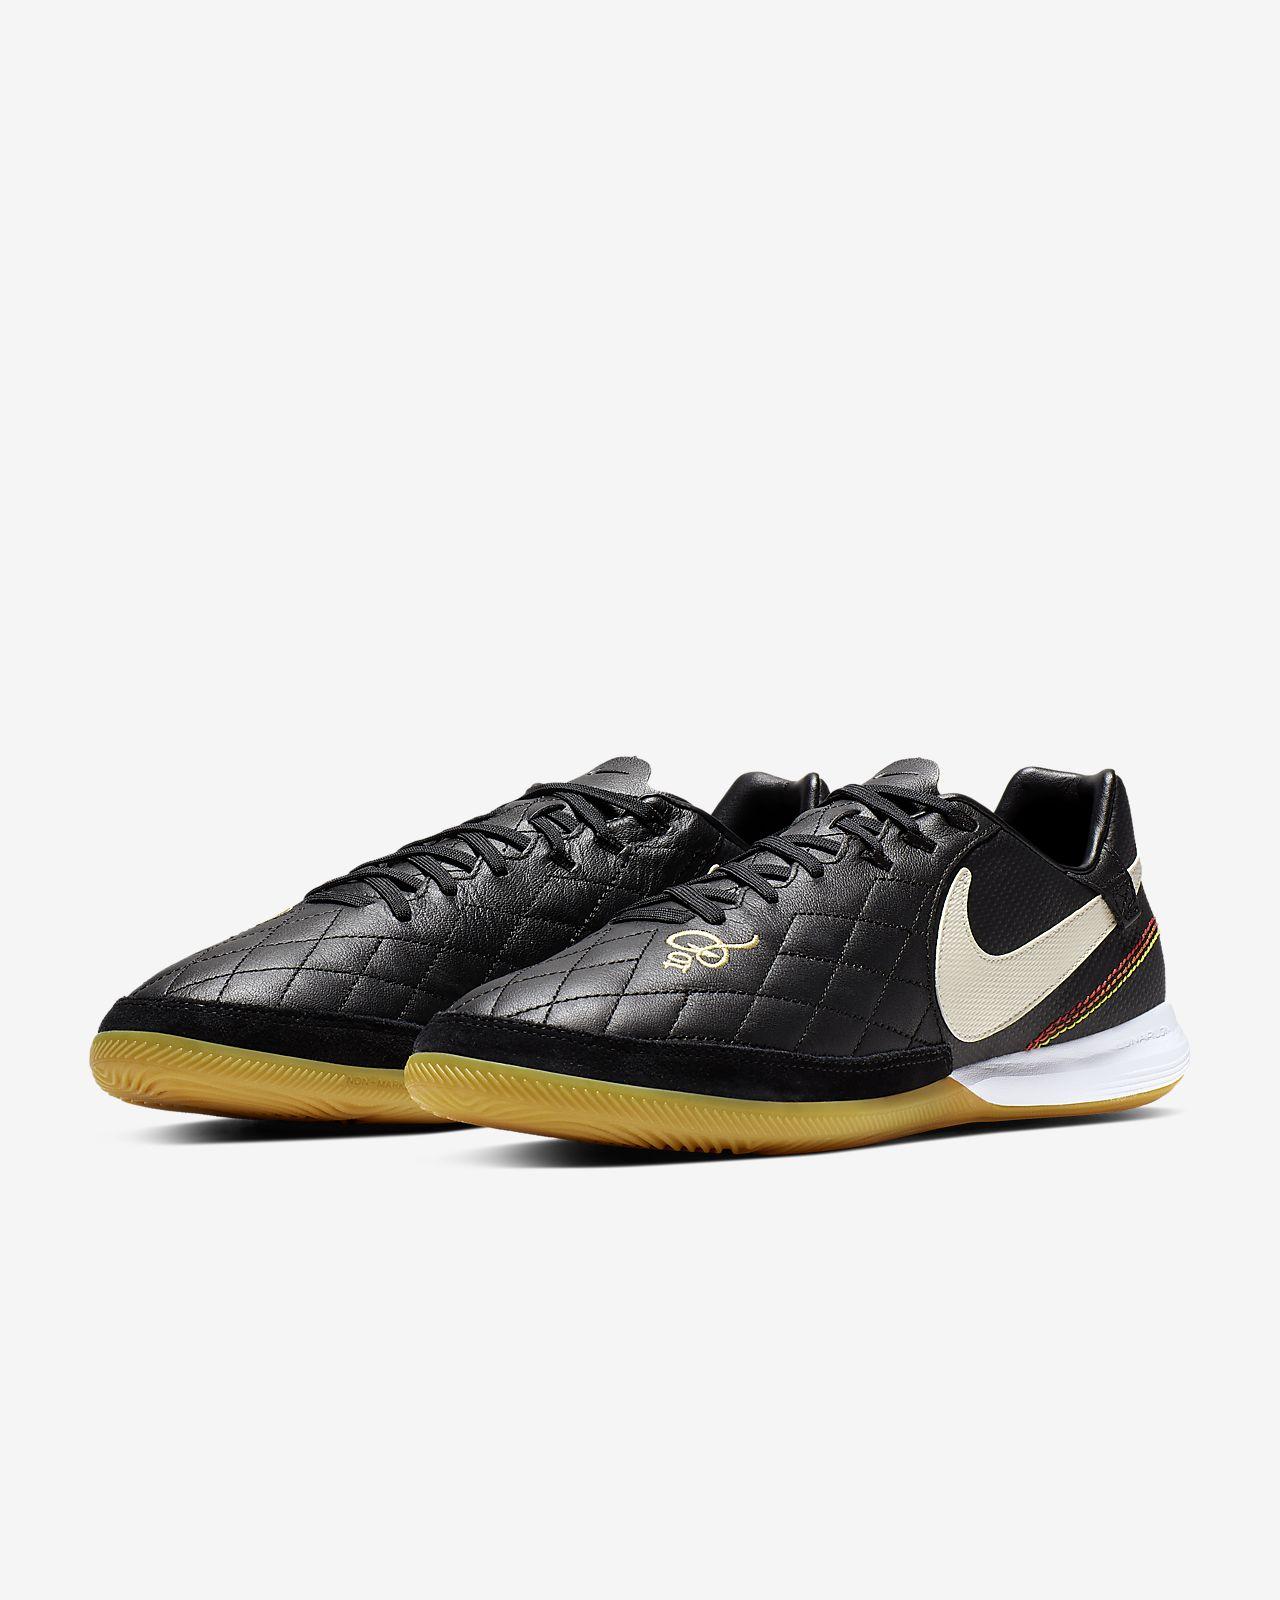 wholesale dealer c85a4 ba599 ... Nike TiempoX Lunar Legend VII Pro 10R Indoor Court Football Shoe